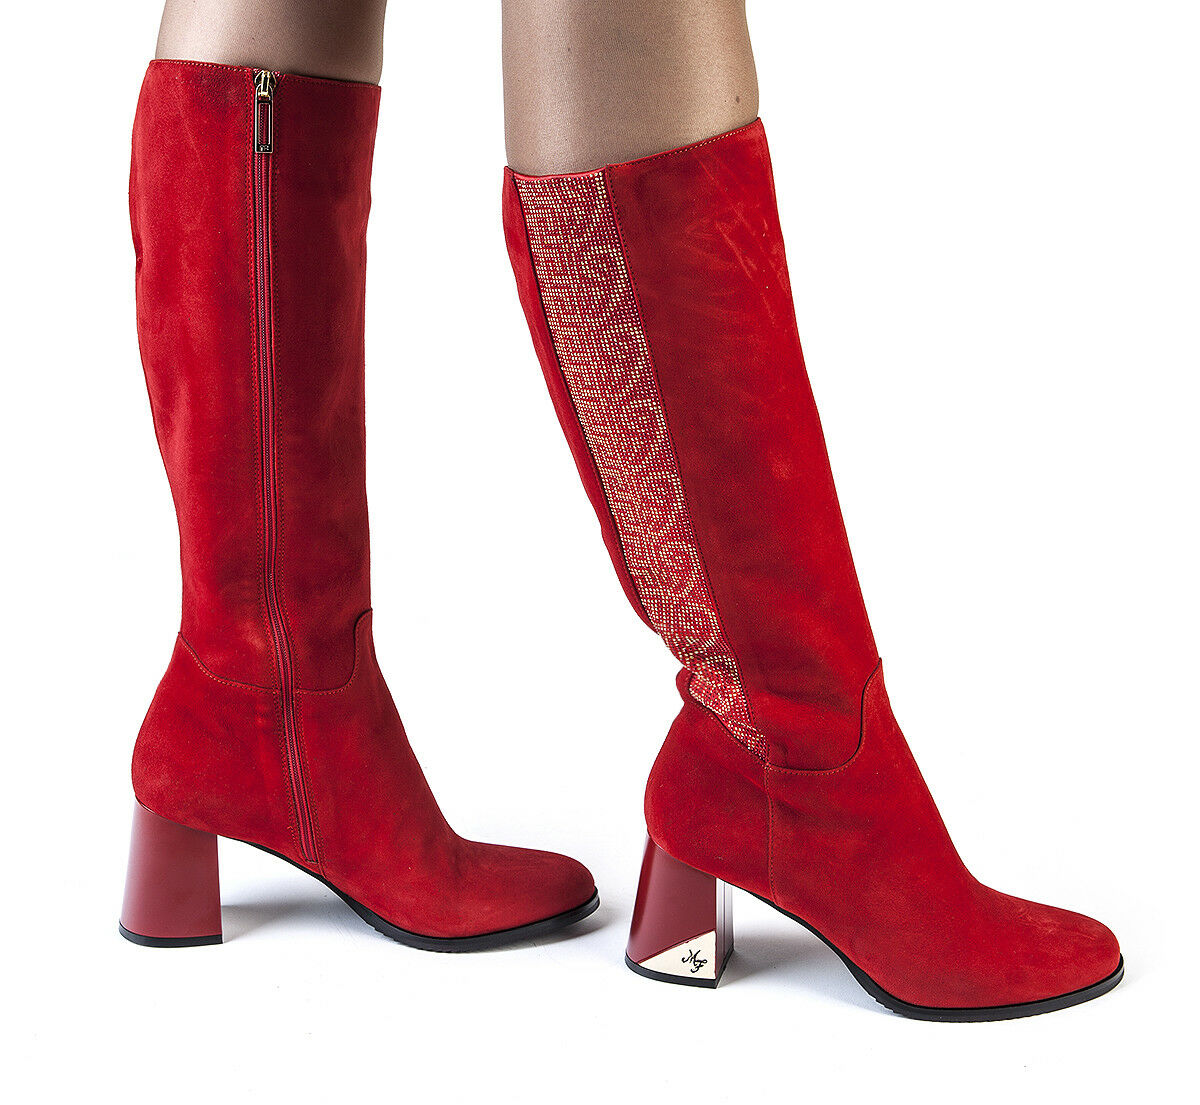 Authentic Marino Fabiani Italian Designer Boots Sizes 5,7,8,9,10 New Red